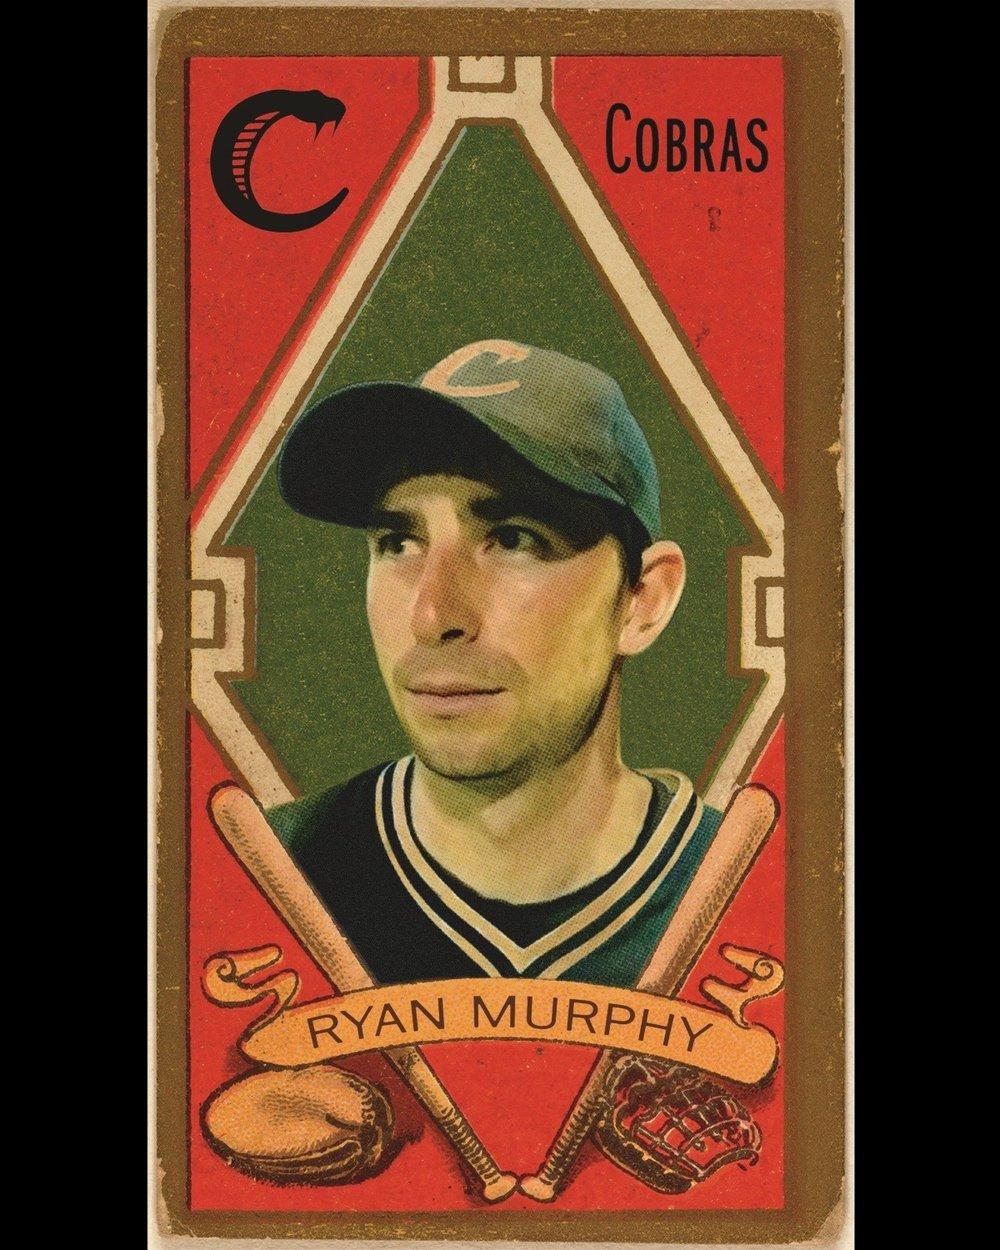 #28 - Ryan Murphy